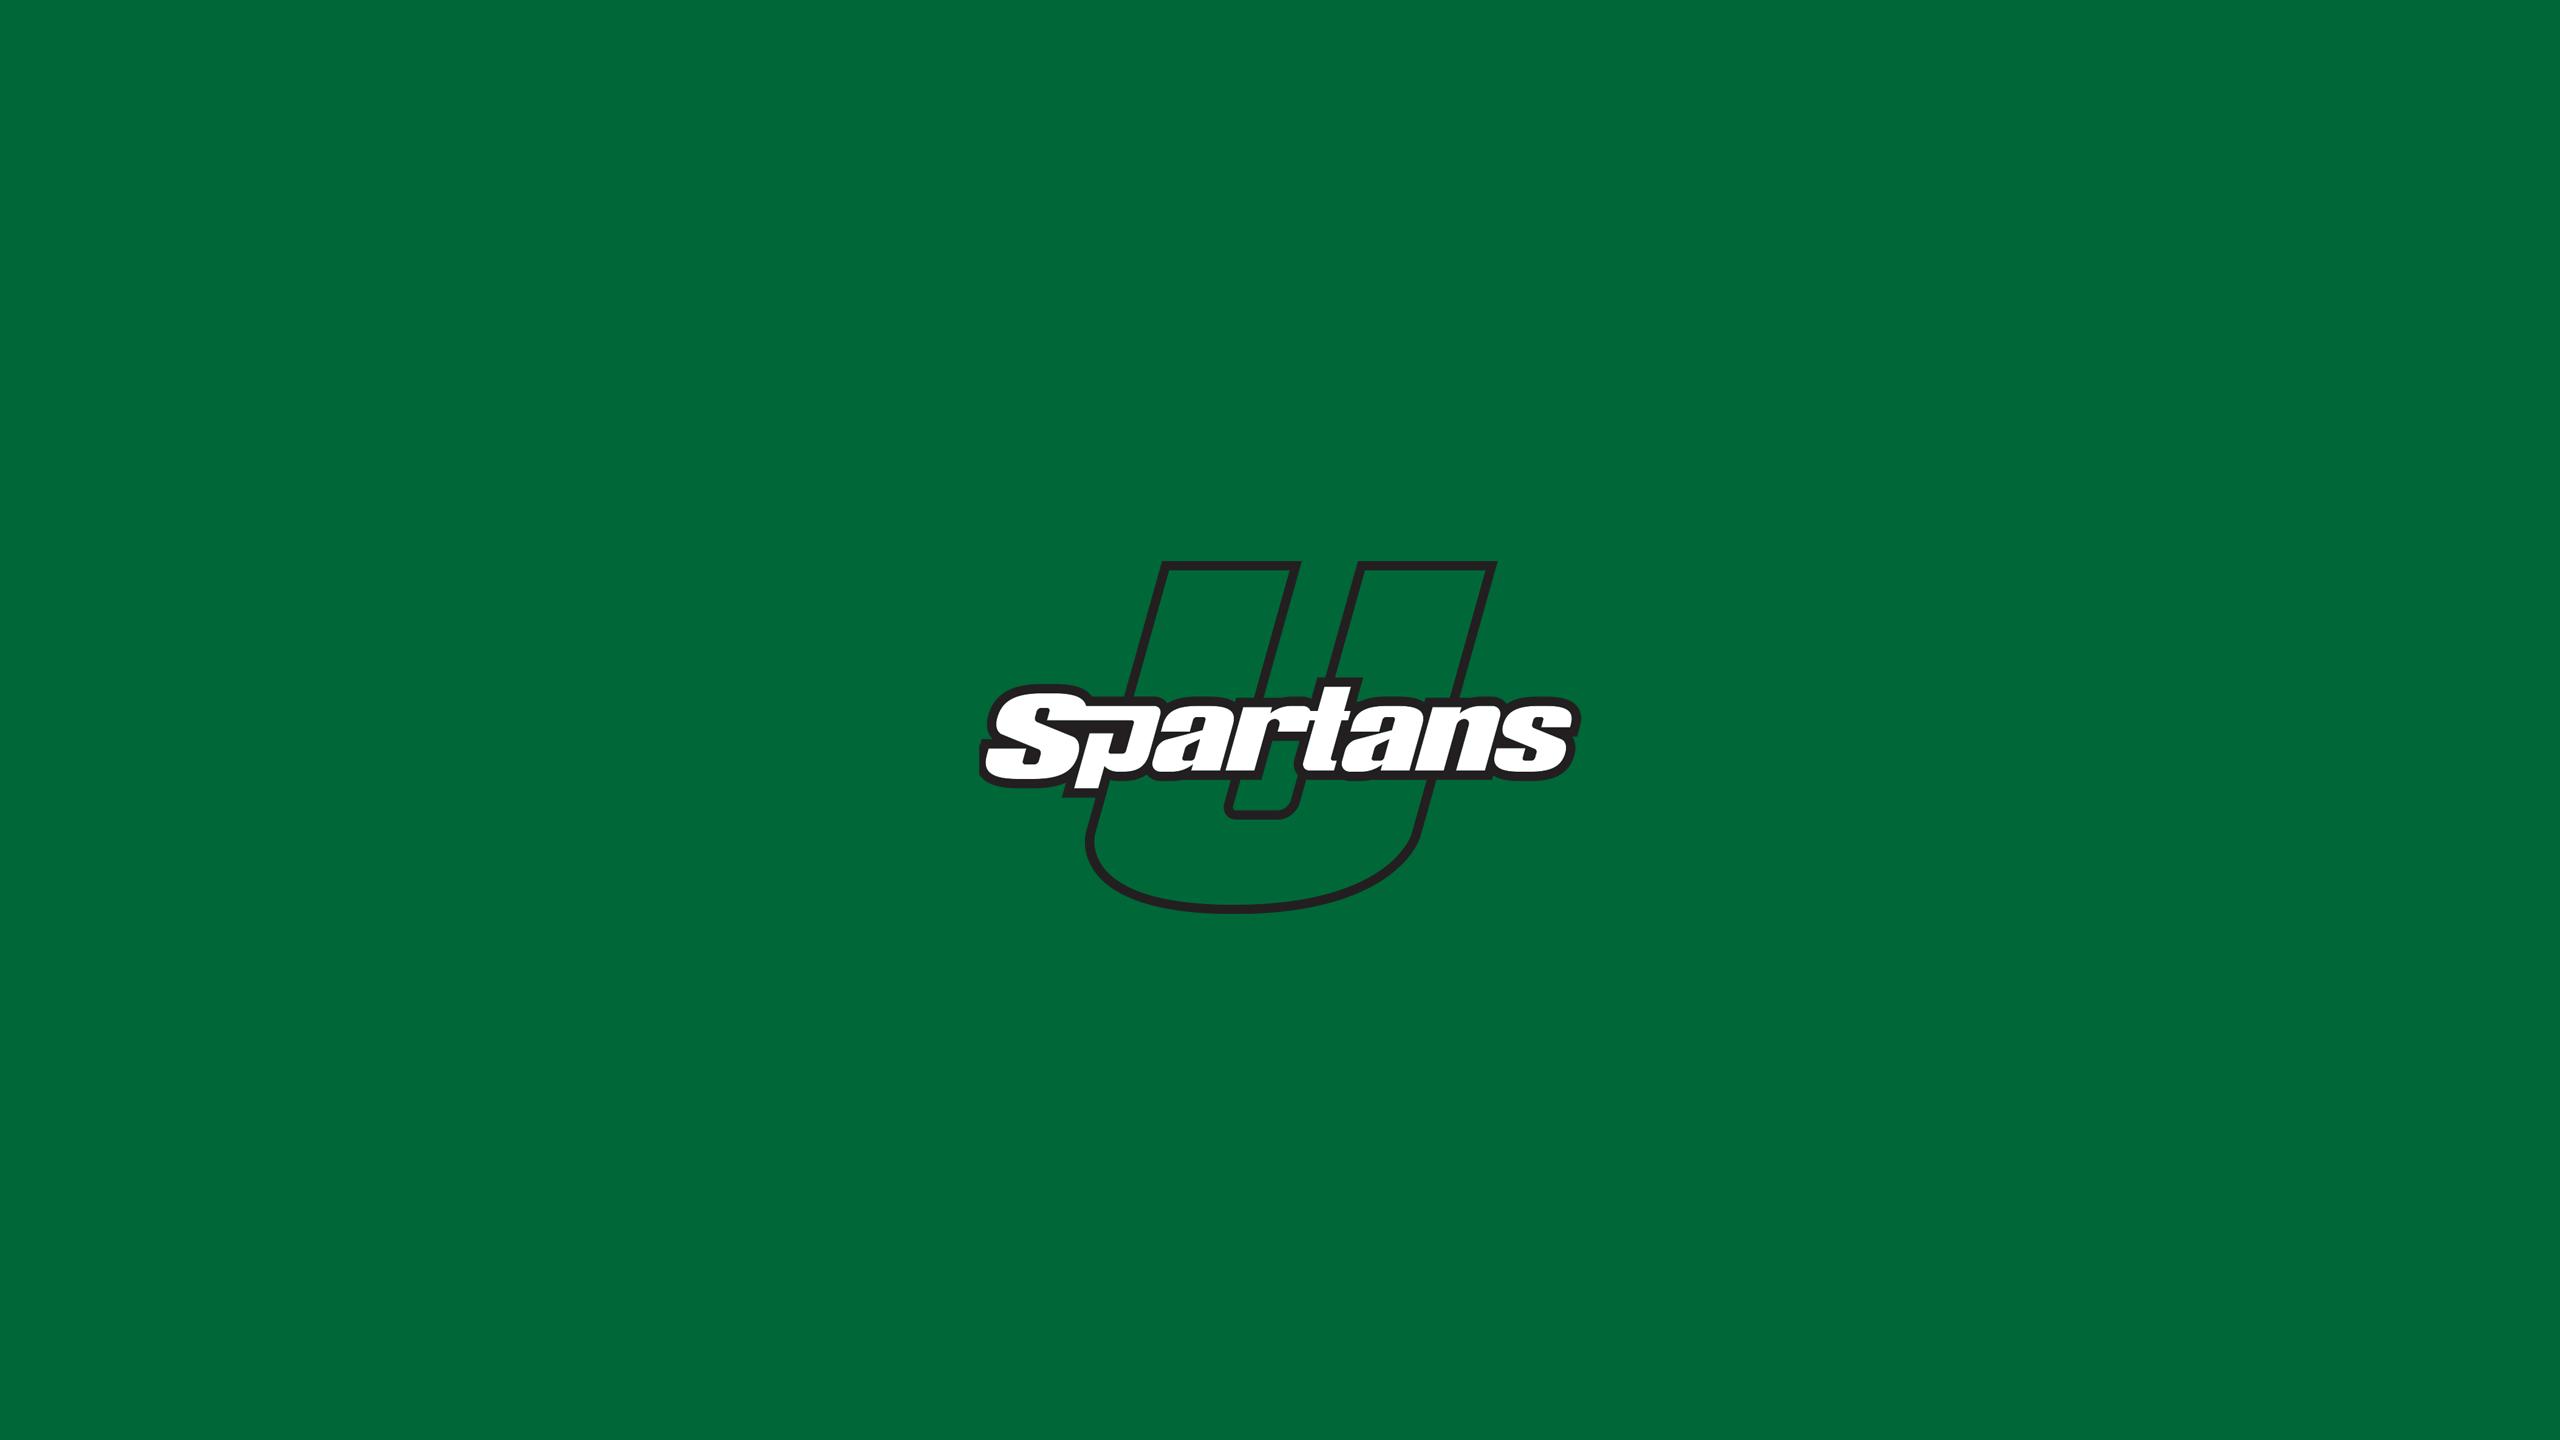 University of South Carolina - Upstate Spartans